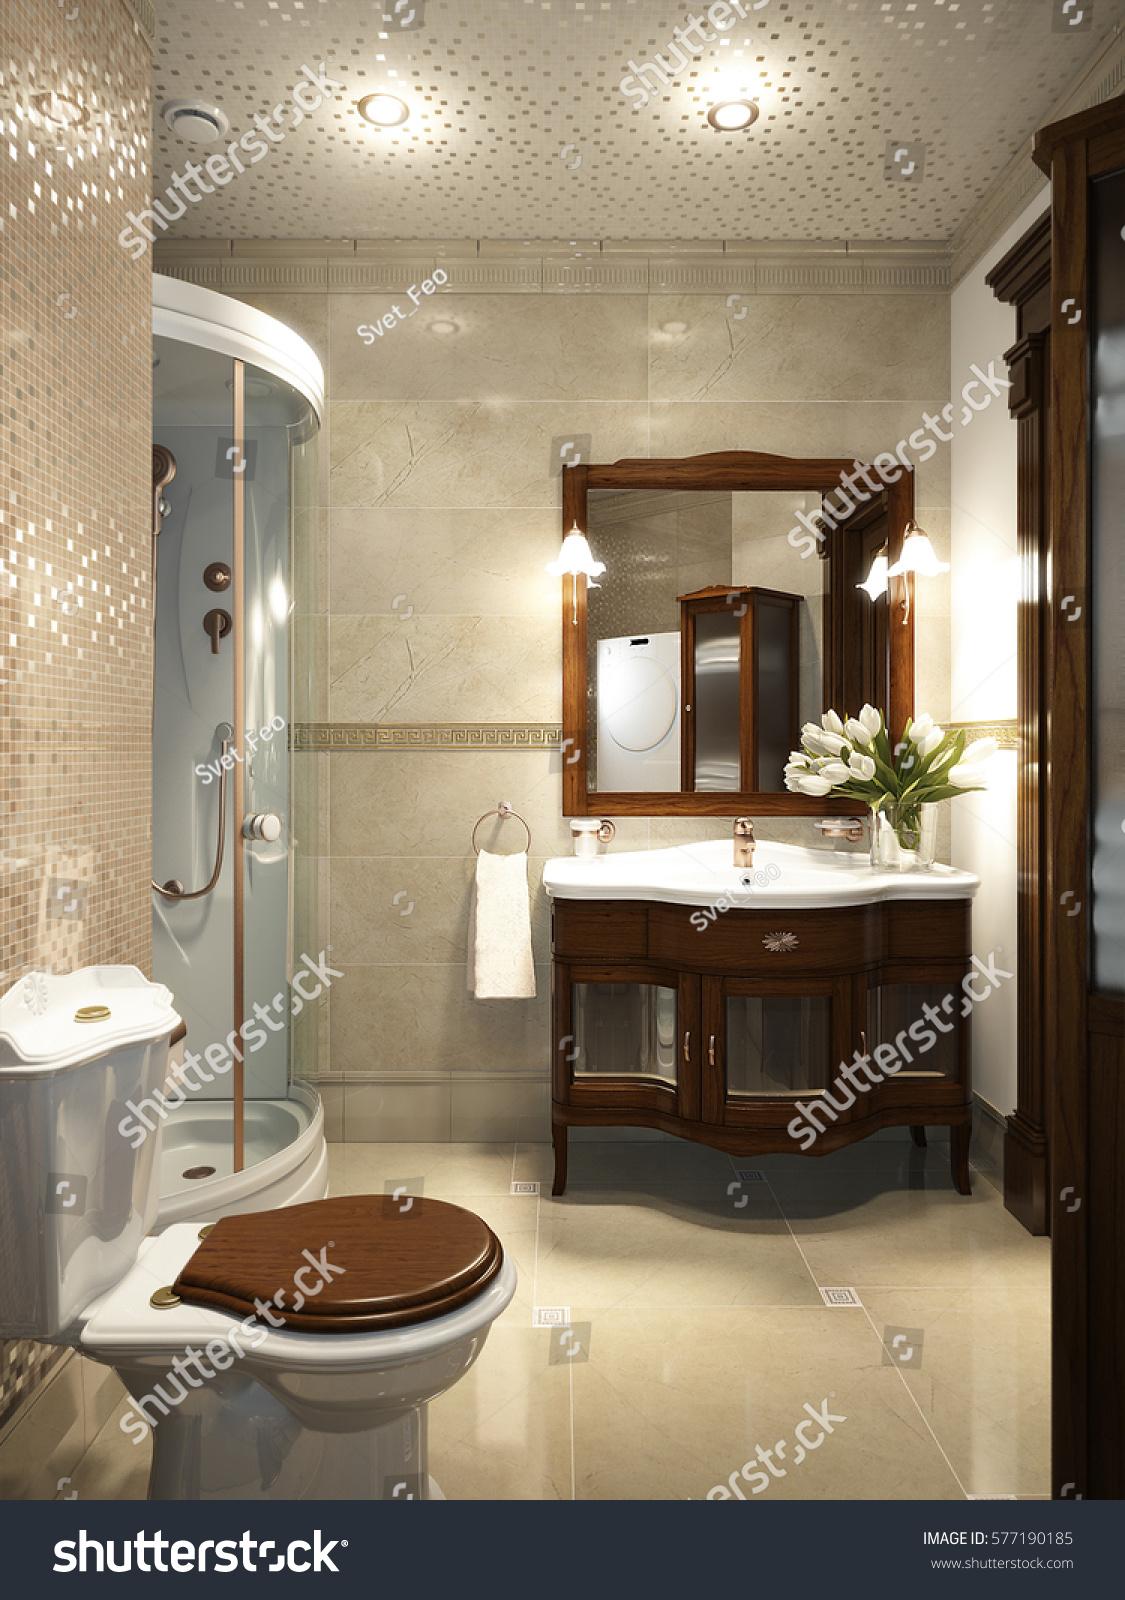 3d Interior Room Design: Bright Classic Traditional Laundry Room Bathroom Stock